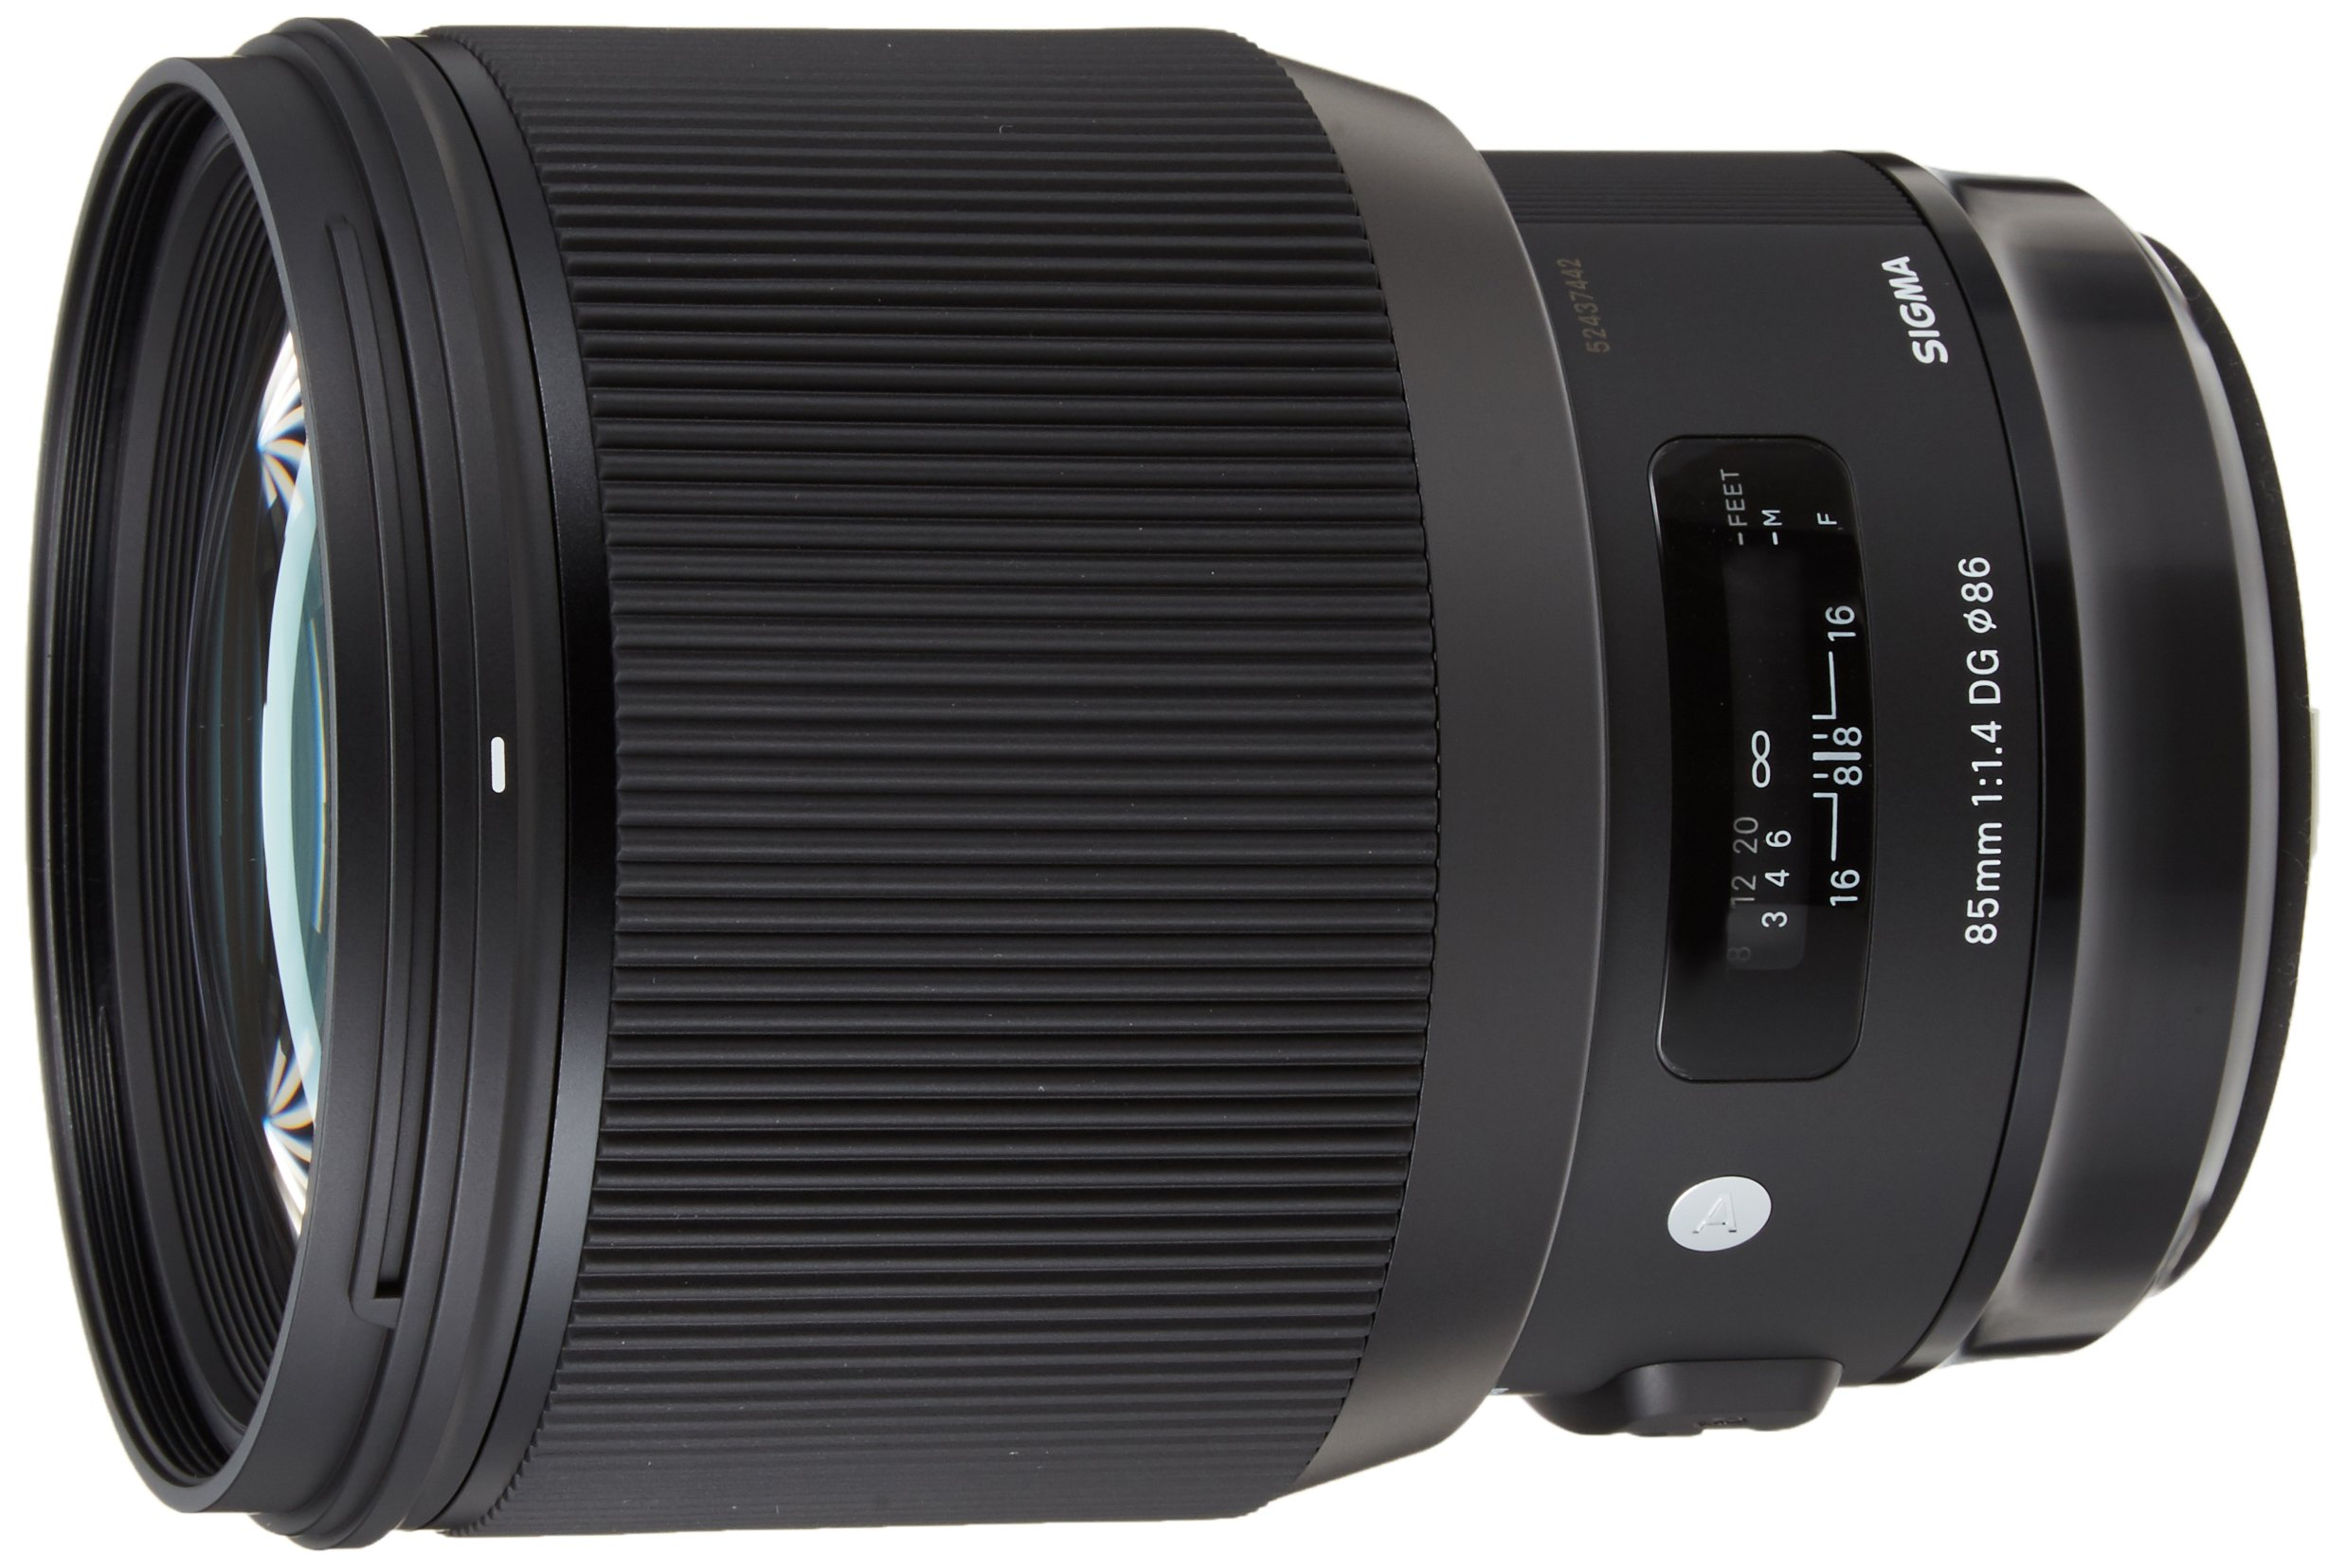 Sigma HSM ART Obiettivo 85 mm-F/1.4-AF a DG HSM, Attacco Canon, Nero